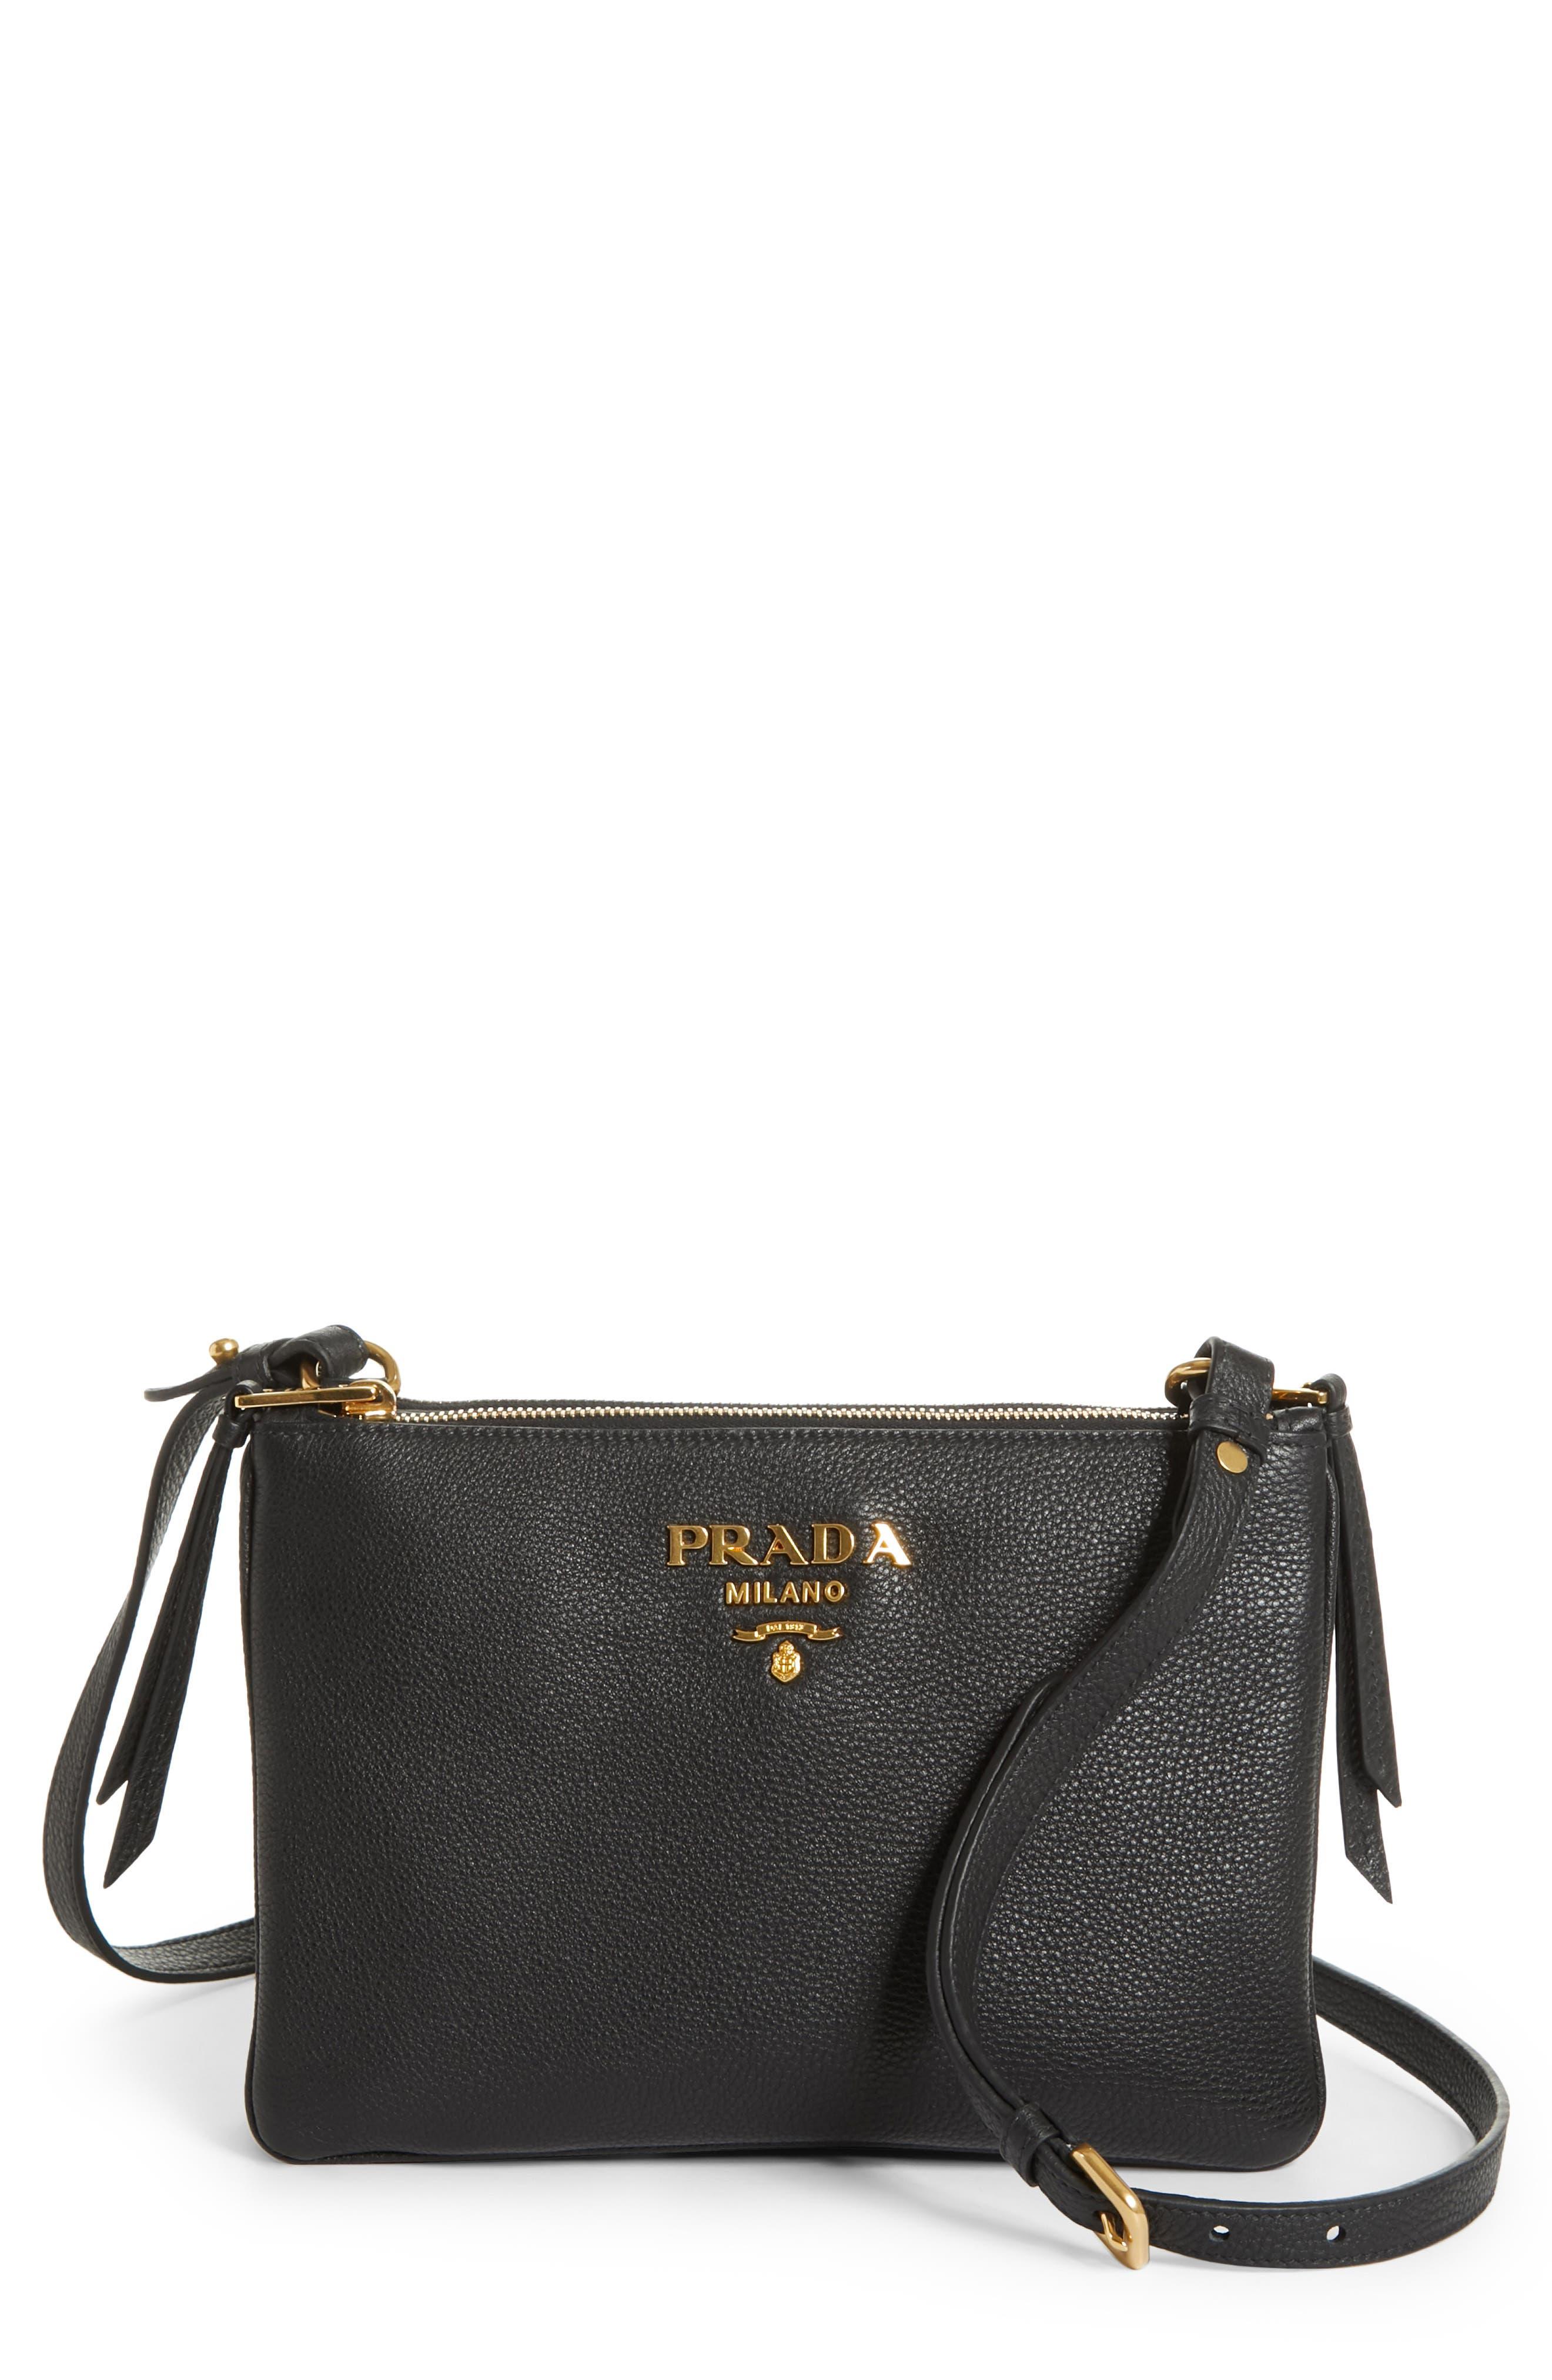 Main Image - Prada Vitello Daino Double Compartment Leather Crossbody Bag